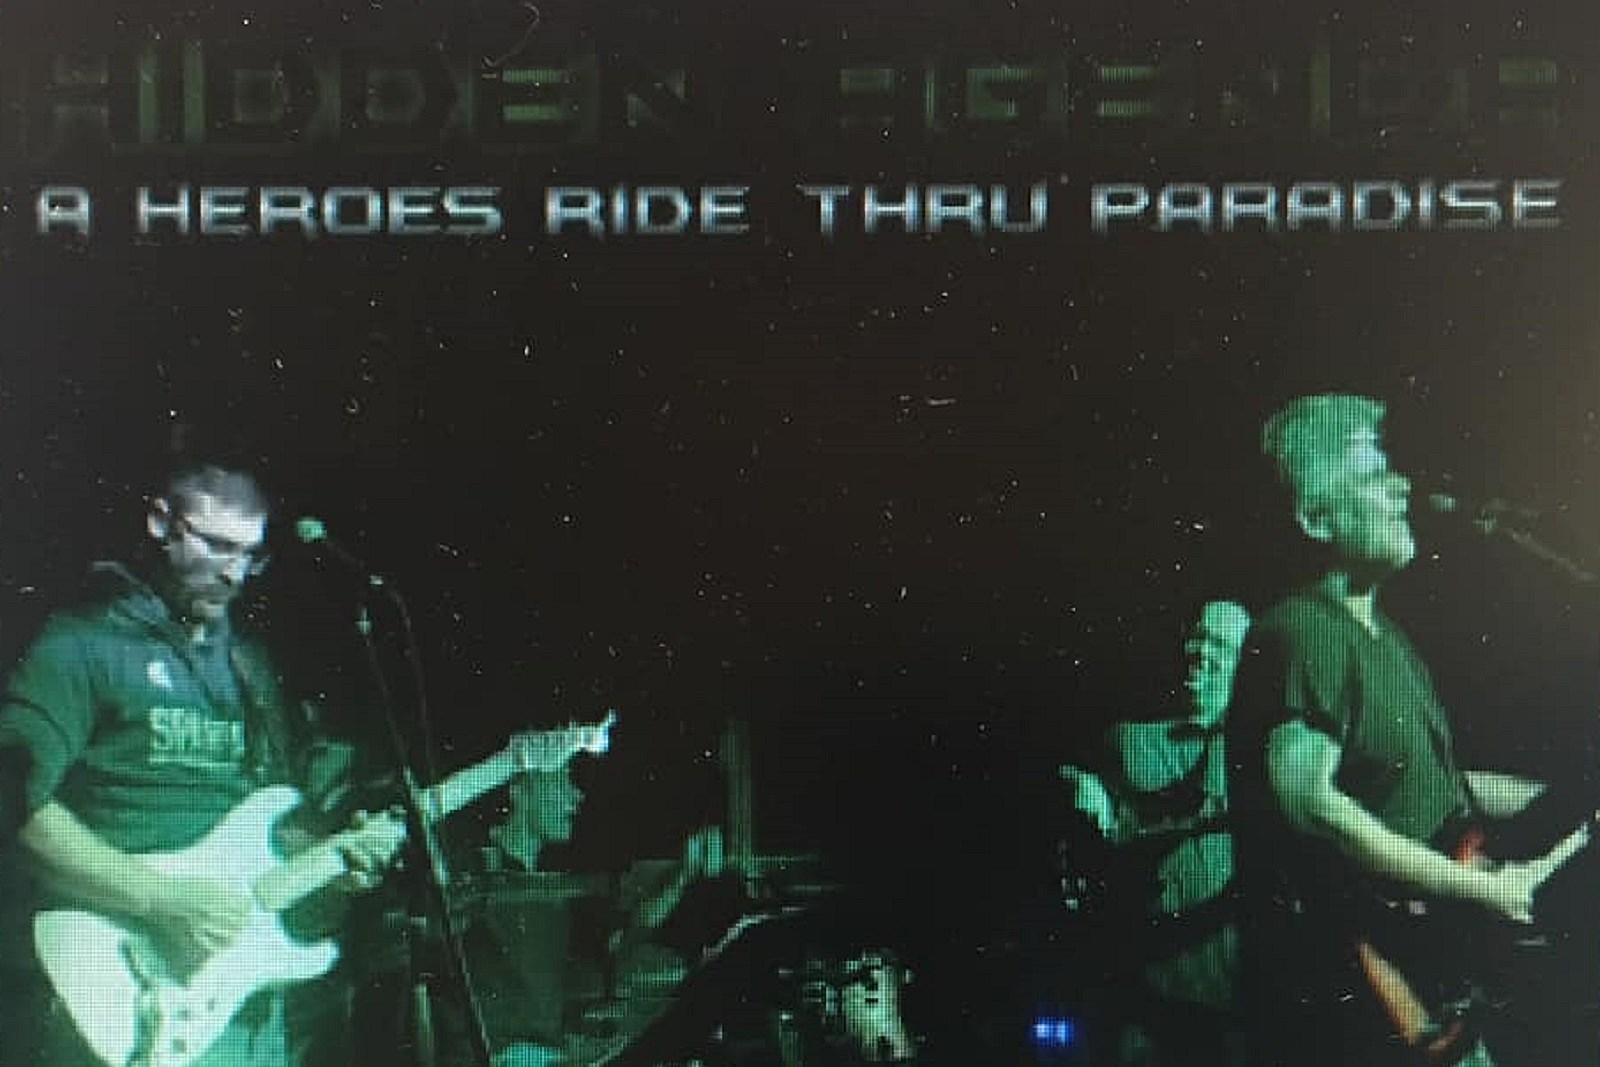 Support Local Music New Album From Hidden Agenda